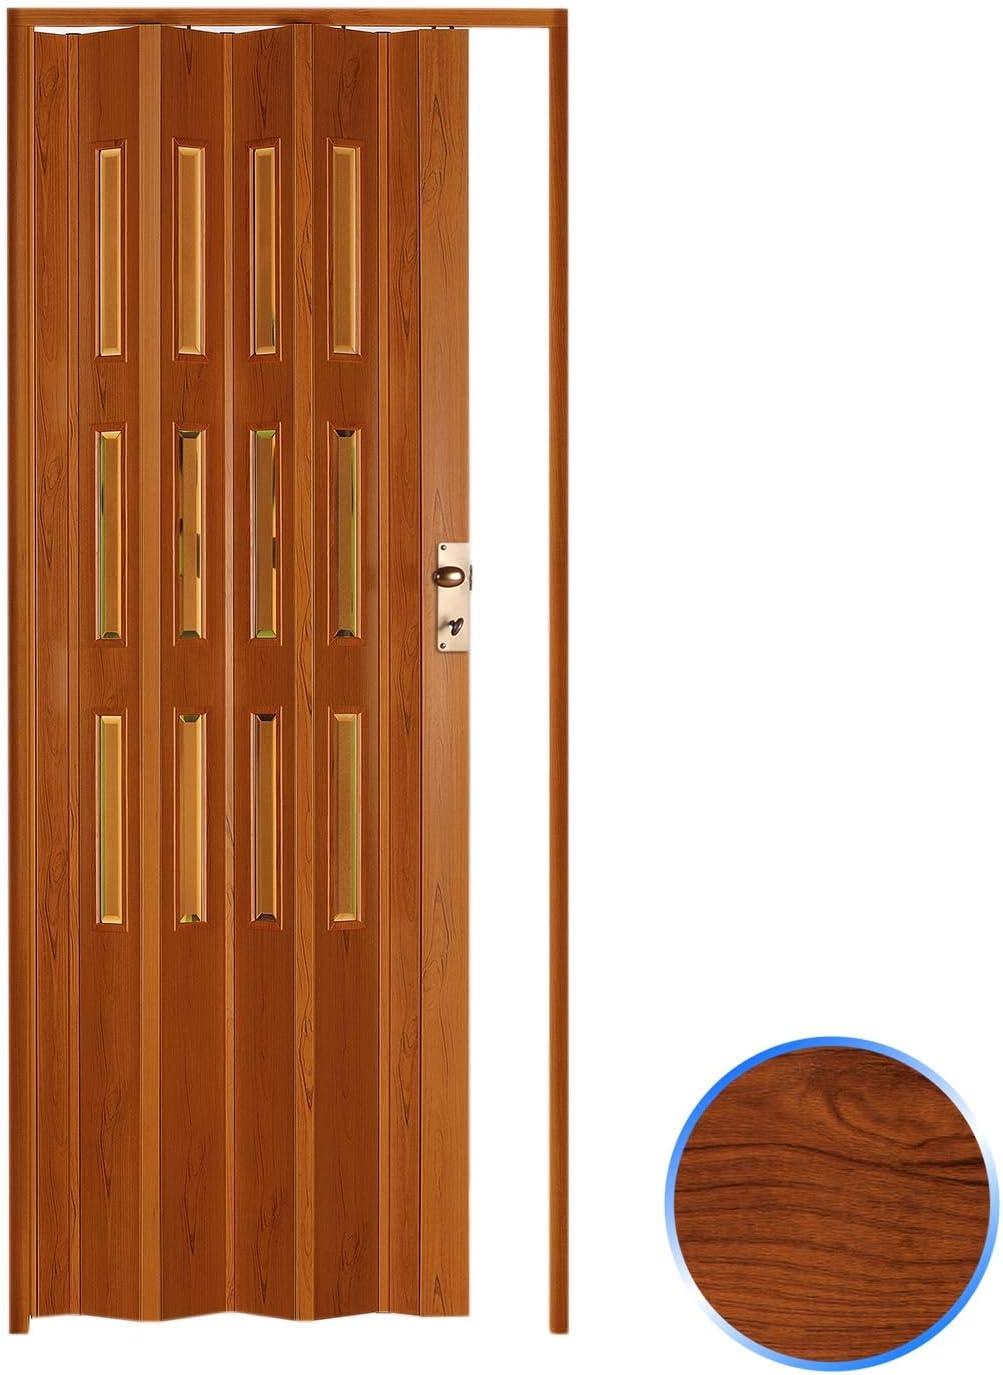 Forte Puerta Plegable de Interior de PVC 88,5x214 cm Cerezo - Vidrio Transparente Mod.Luciana